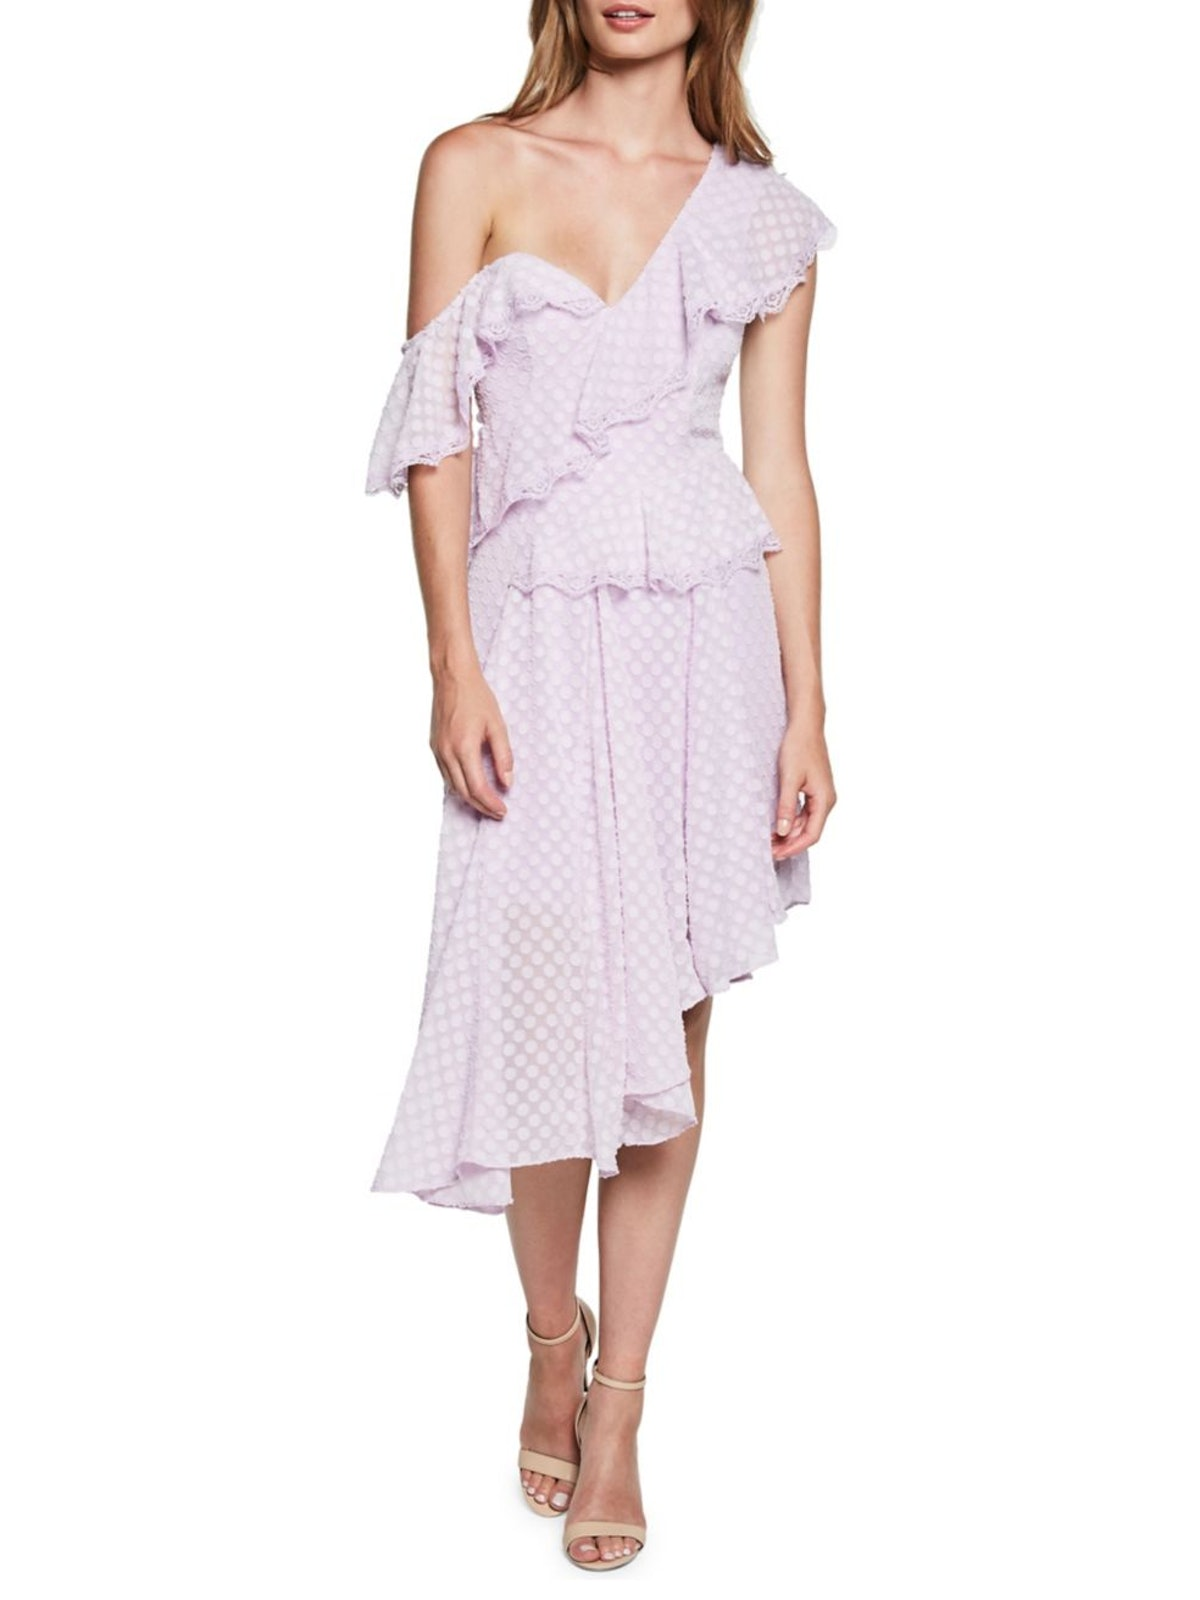 Bardot Senorita One-Shoulder Dress